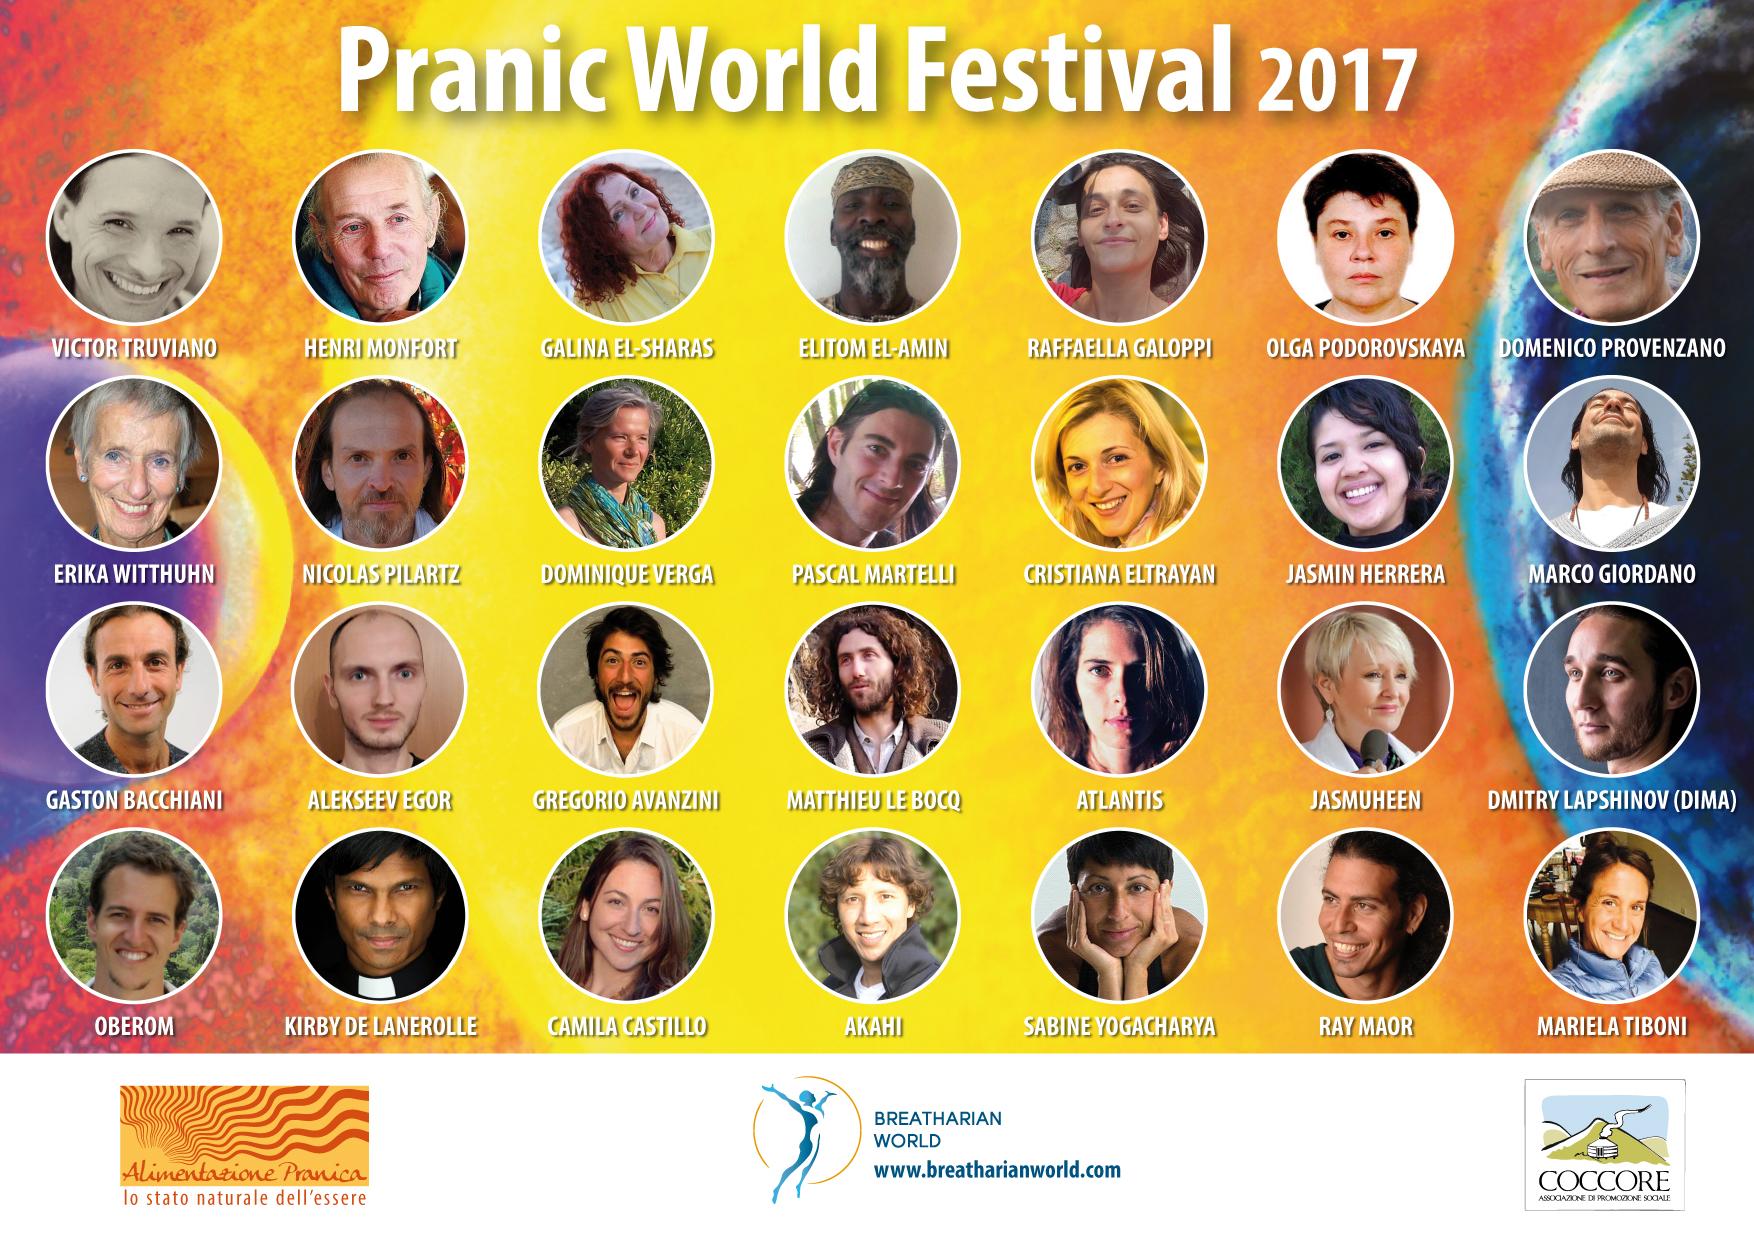 pranic world festival guests